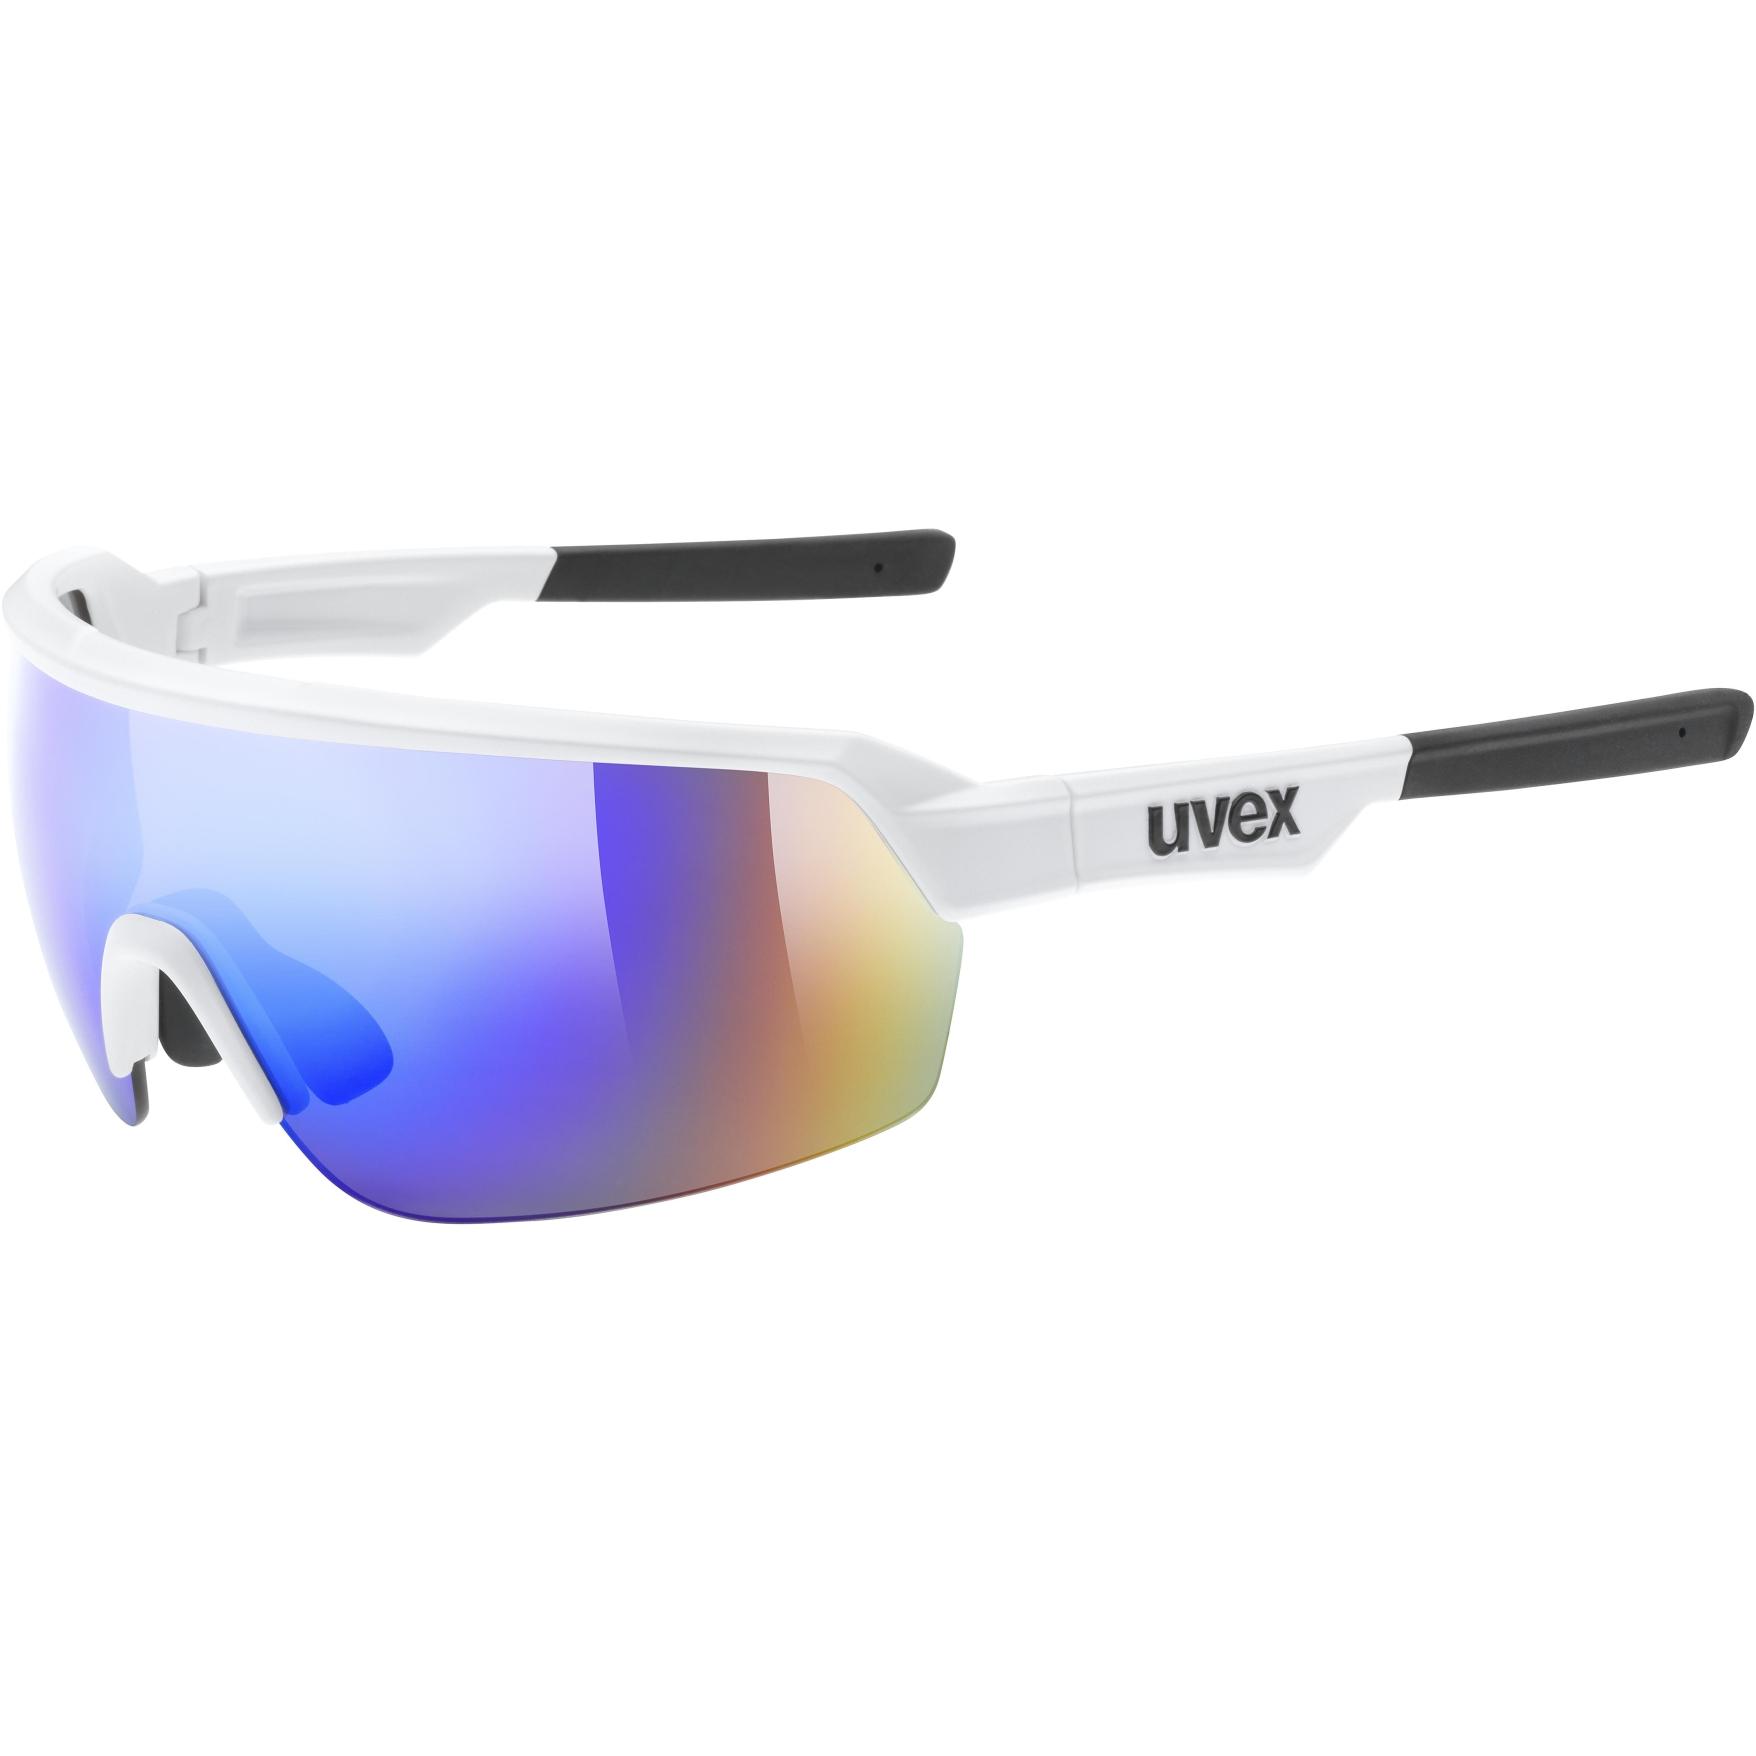 Uvex sportstyle 227 Glasses - white mat/mirror blue